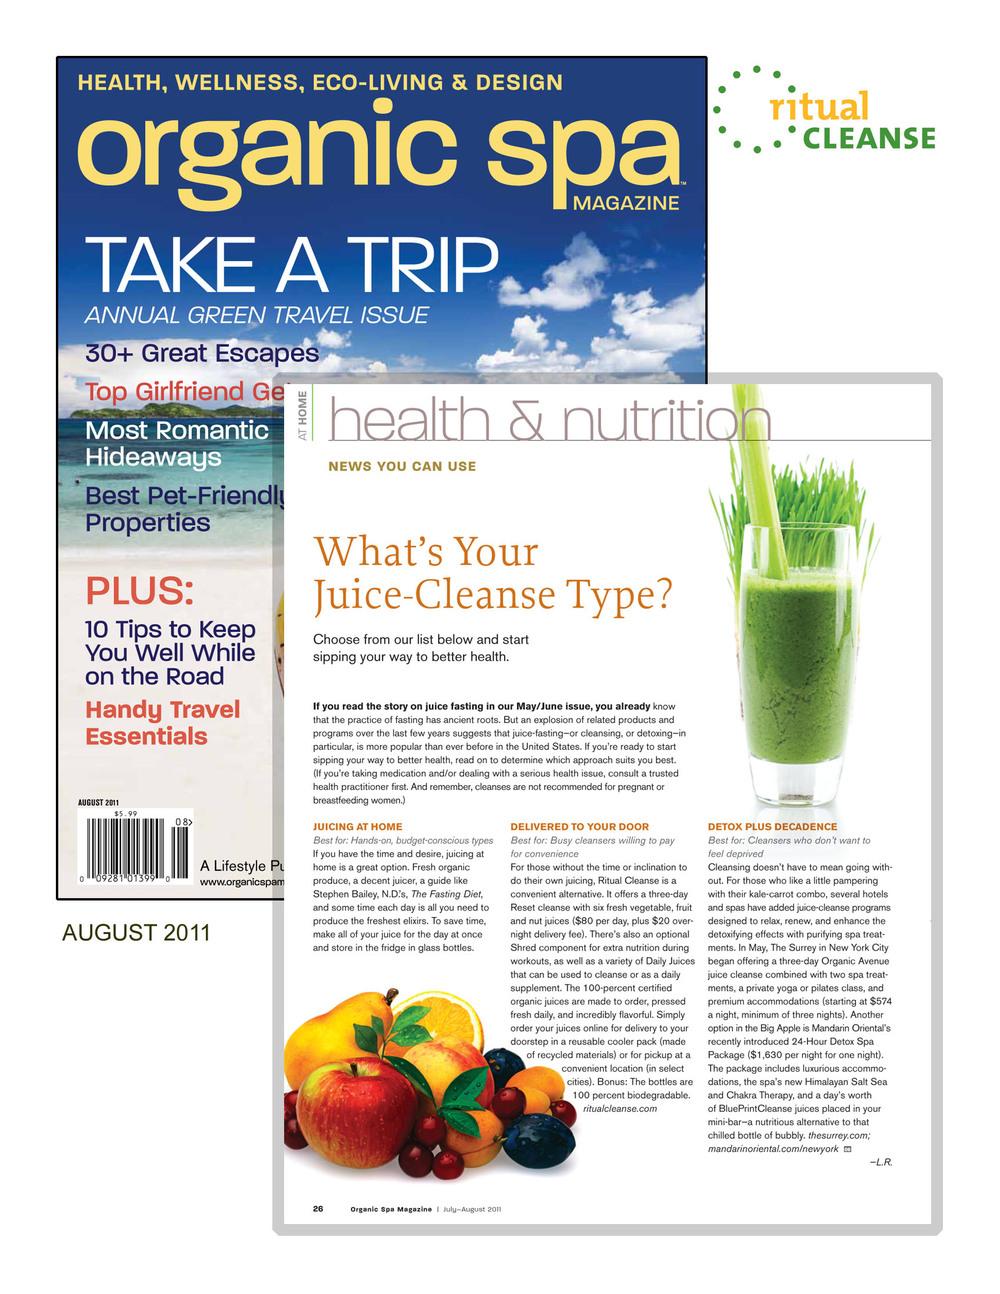 OrganicSpa_August2011.jpg